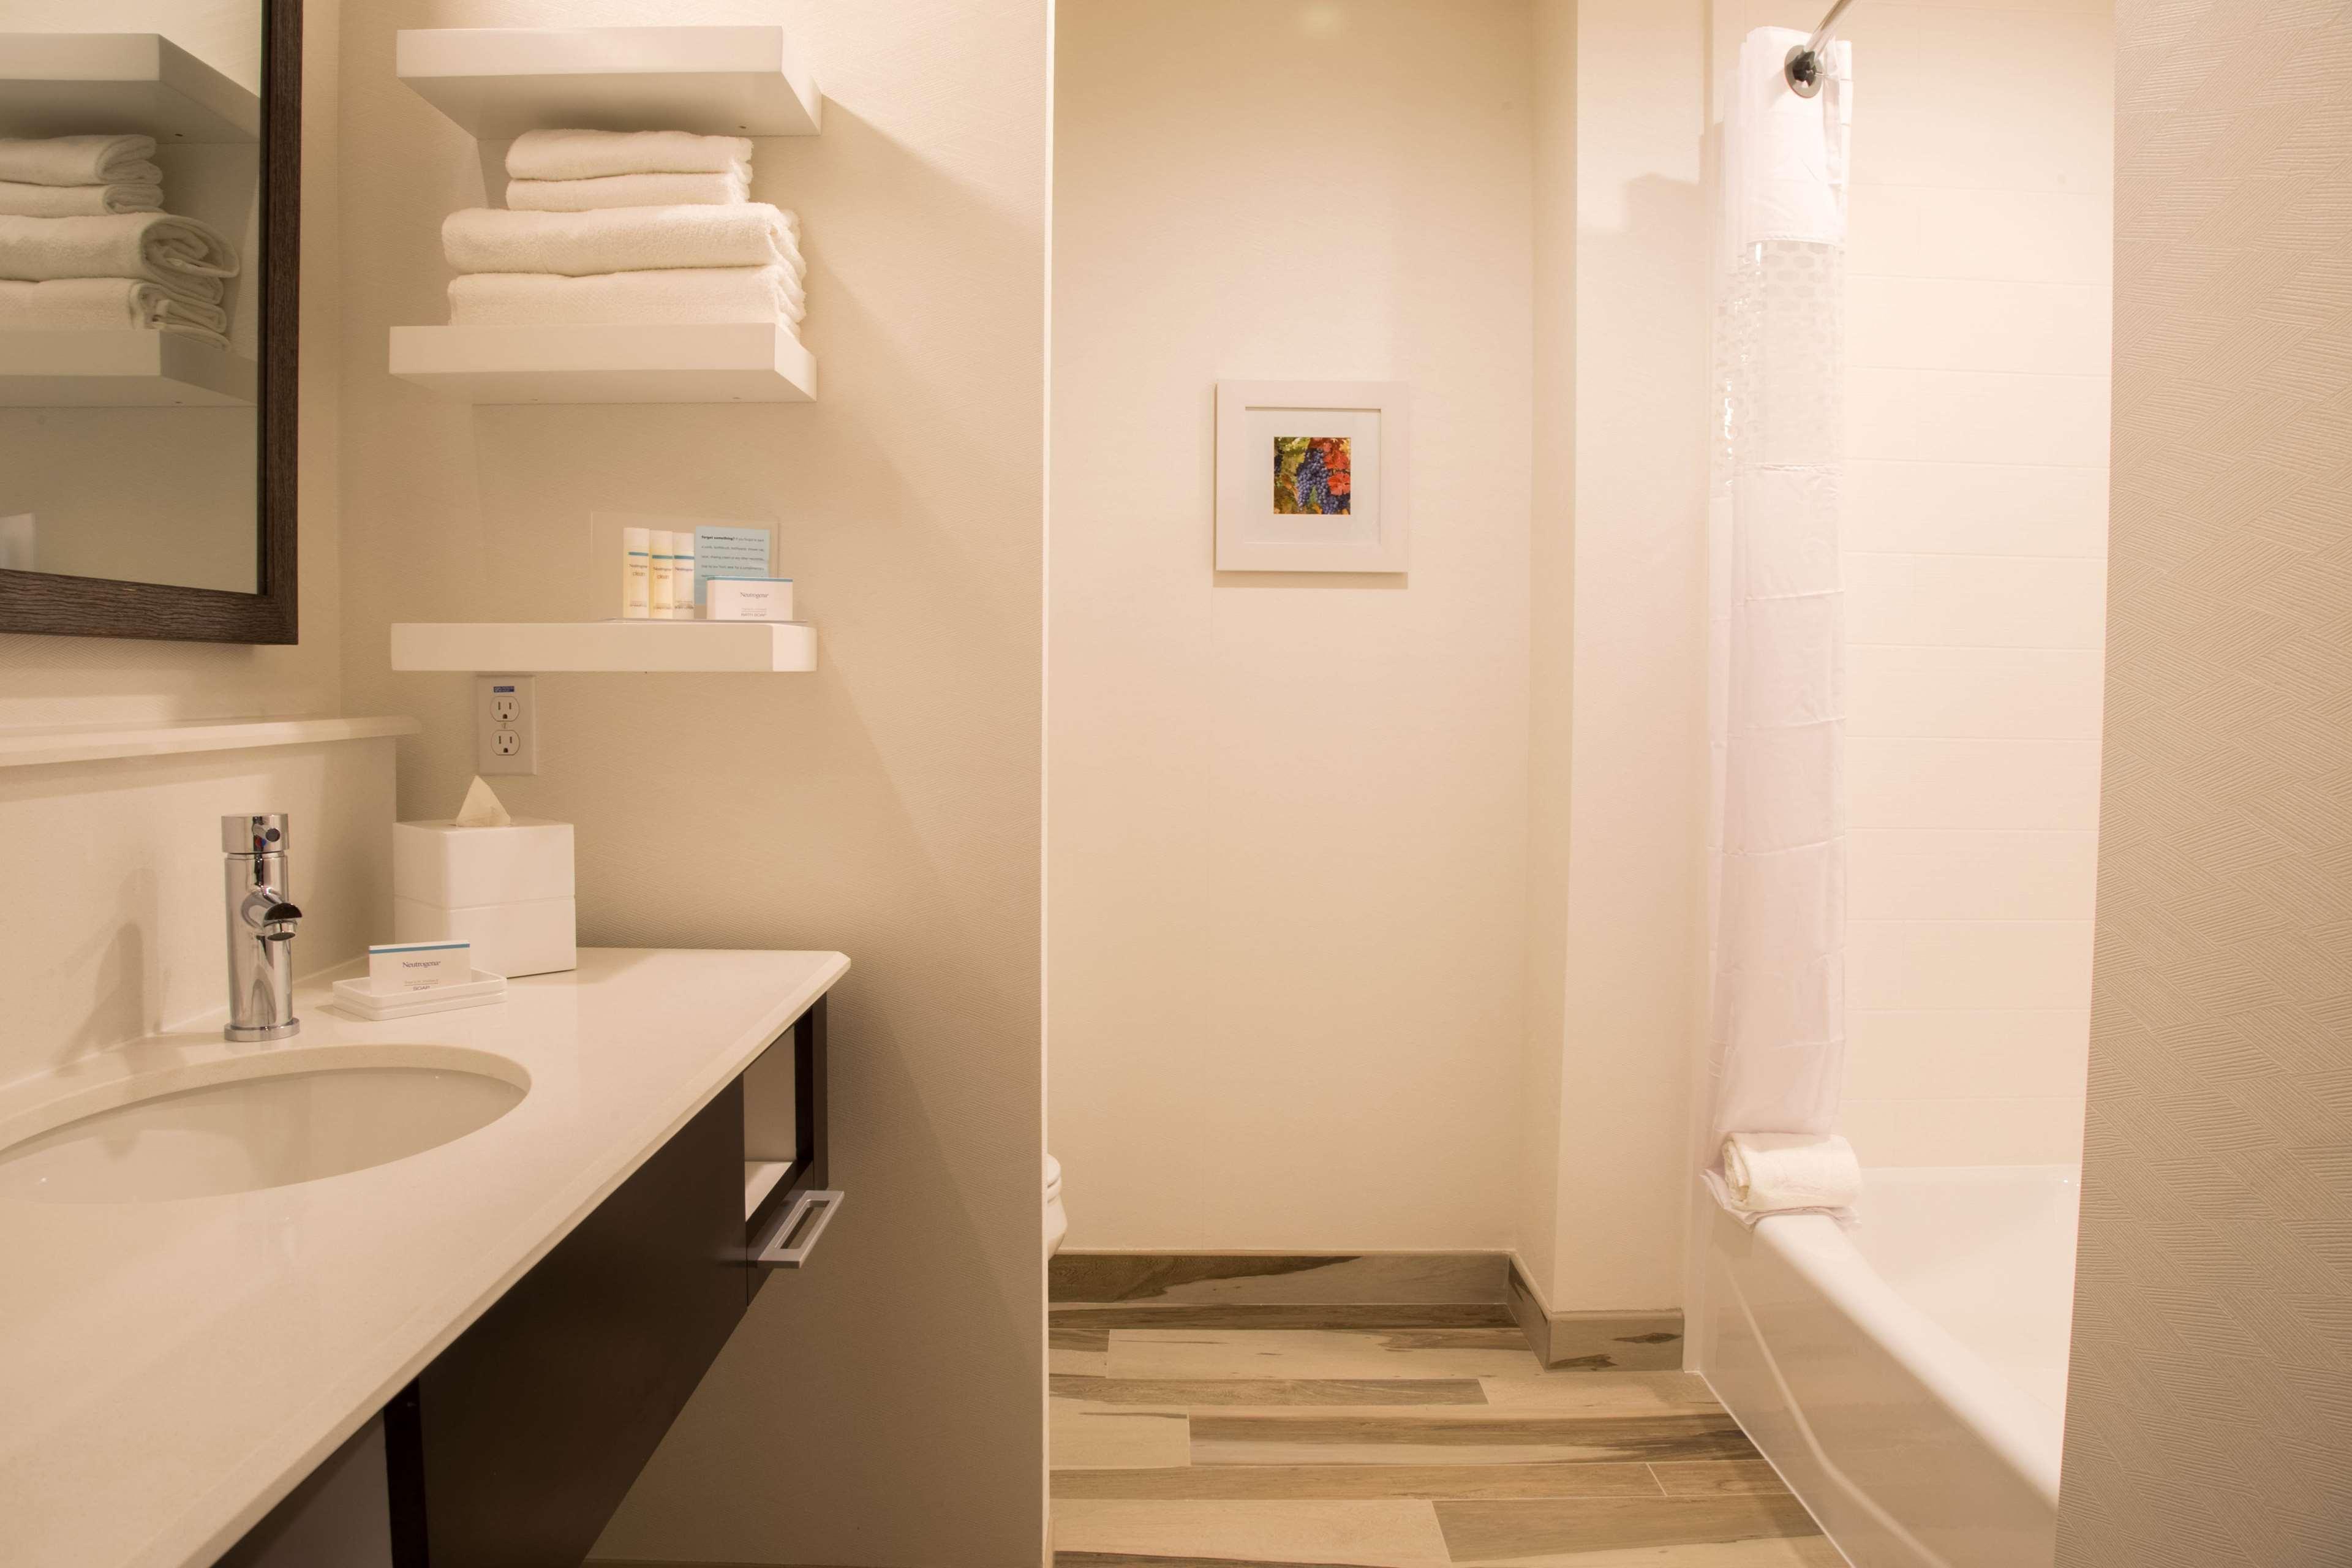 Hampton Inn & Suites Murrieta Temecula image 18